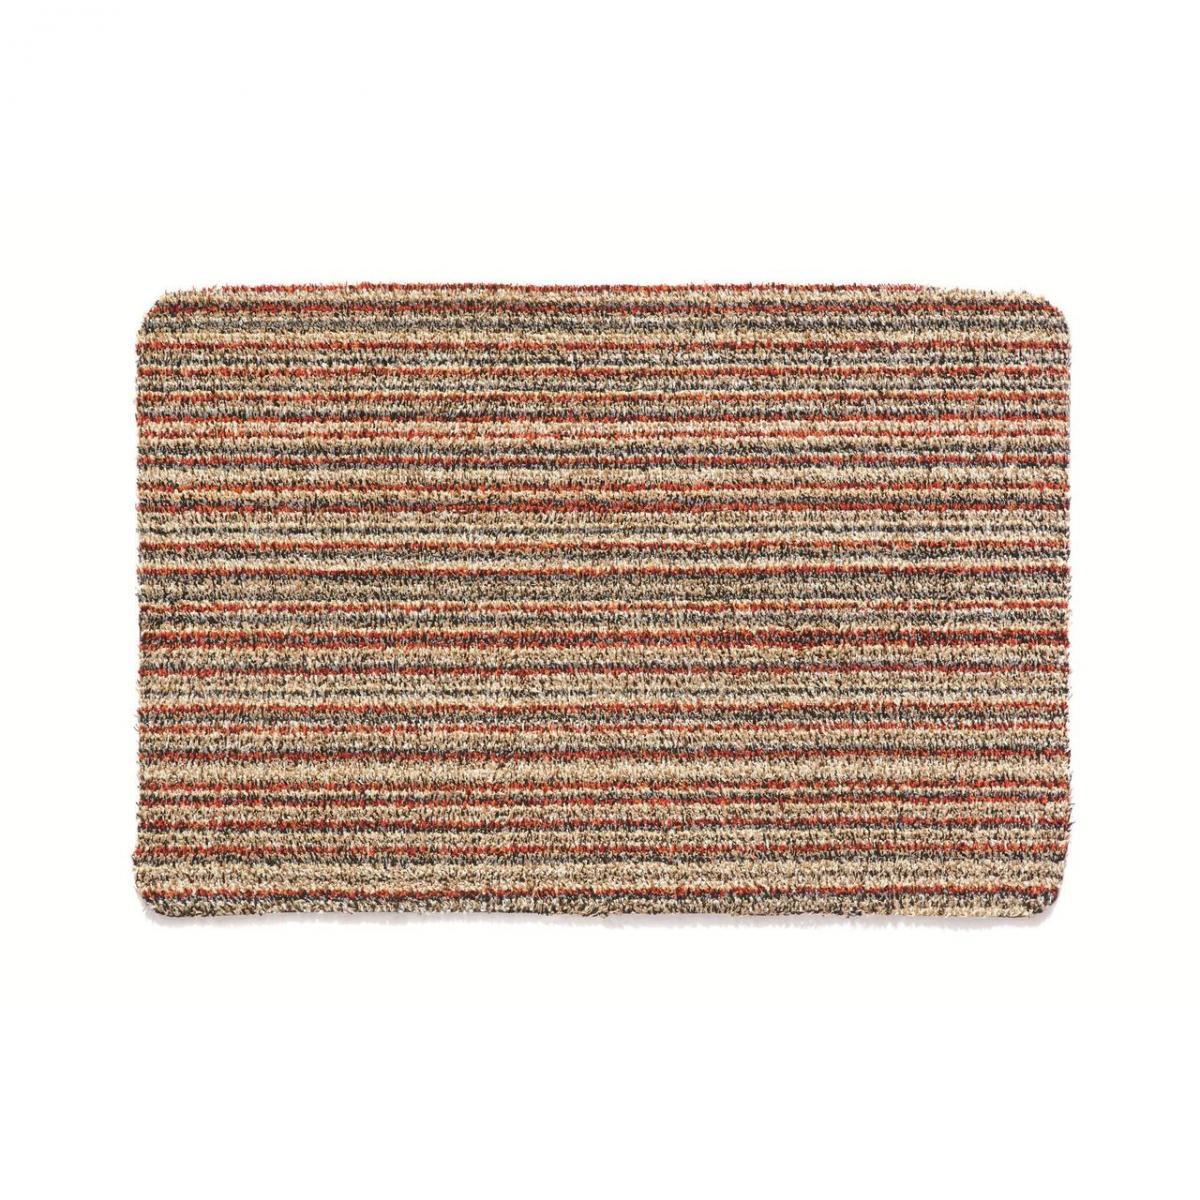 Original Plains Indoor Barrier Mat - Candy Stripe – Now Only £19.00